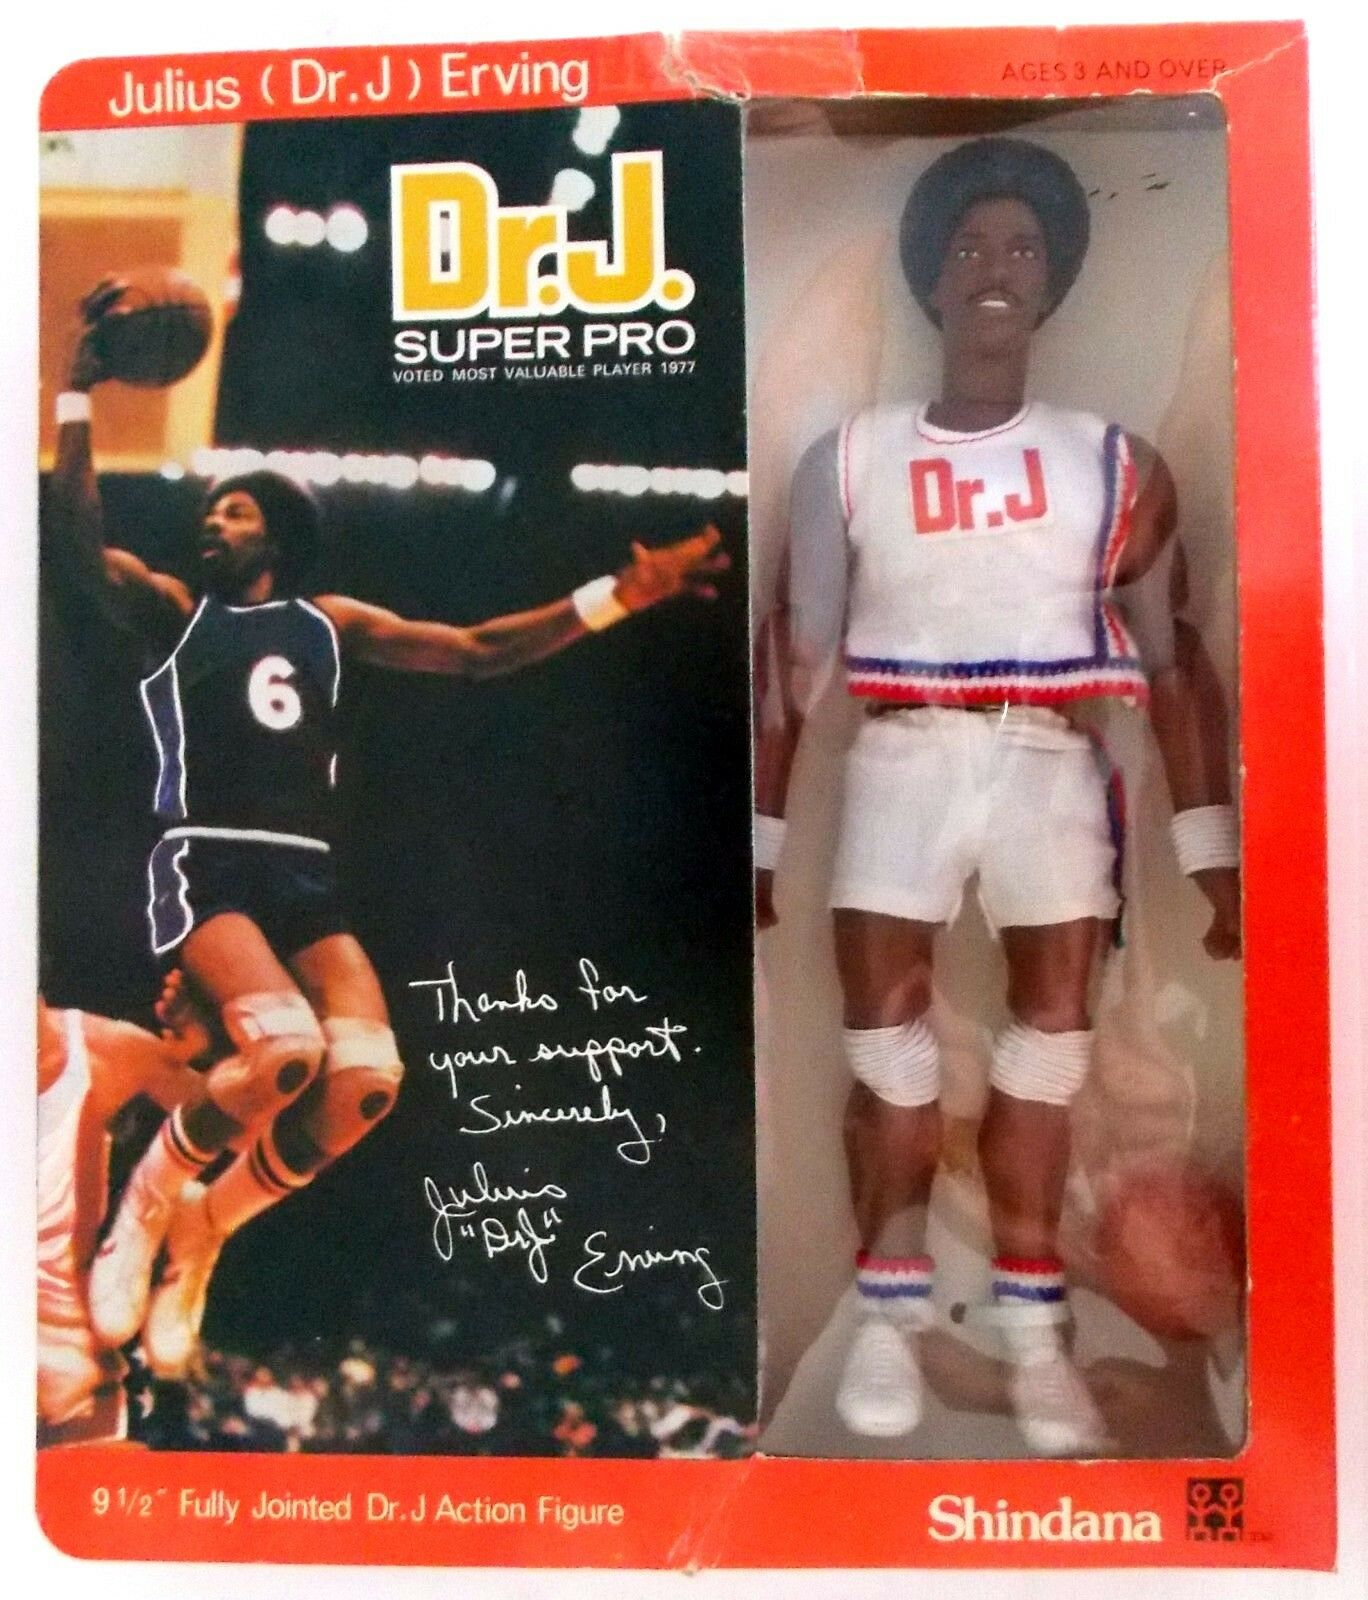 1976 JULIUS ERVING 10  shindana BASKETBALL figure -- -- -- VERSION 2 -- DOCTOR J w Box a6a7e3